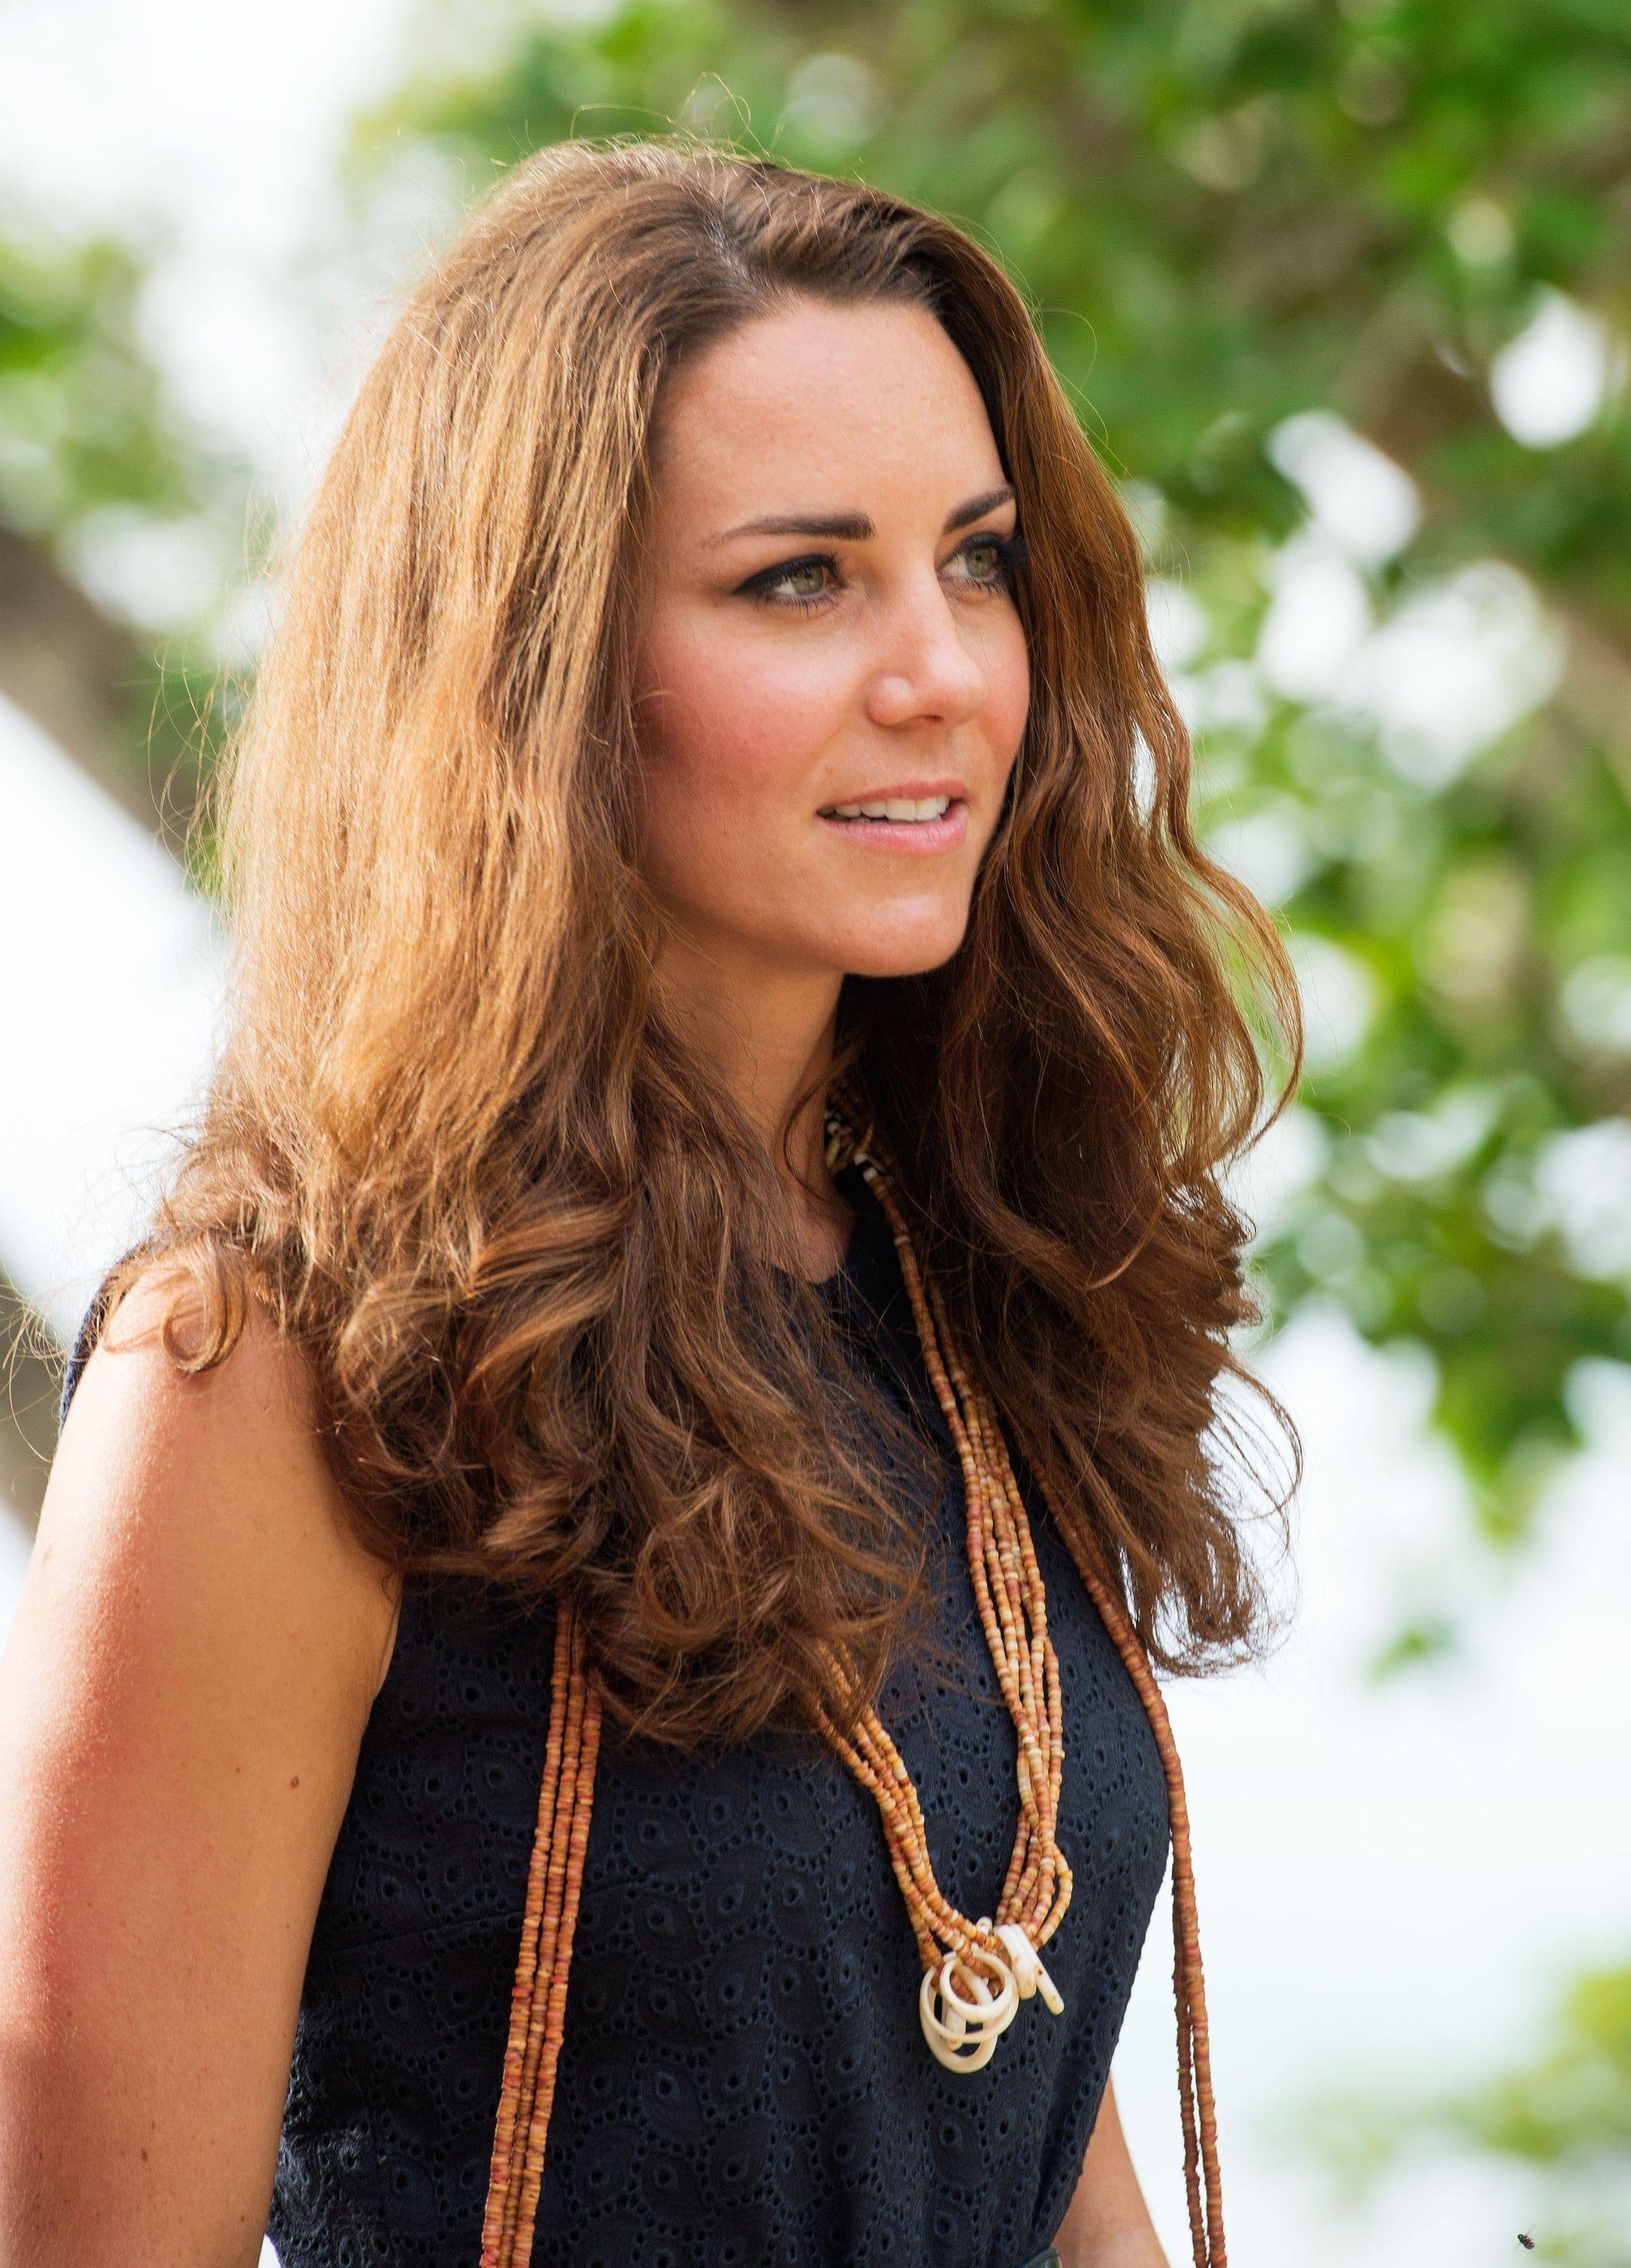 Kate Middleton S Natural Waves 2012 Kate Middleton Hair